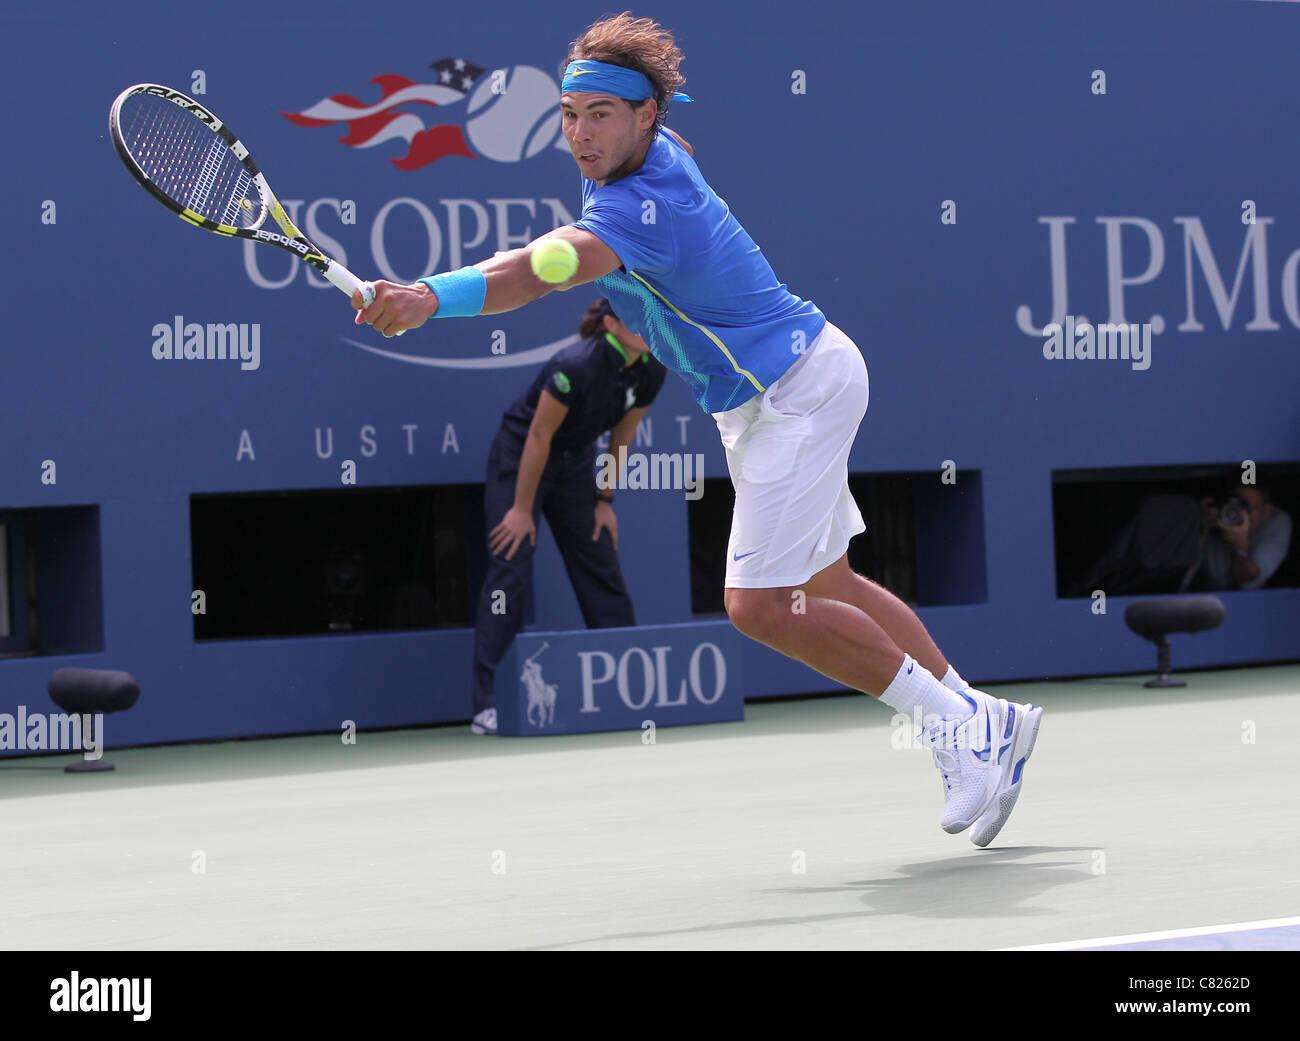 2010 US Open: Rafael Nadal Nike outfit | tennis 201